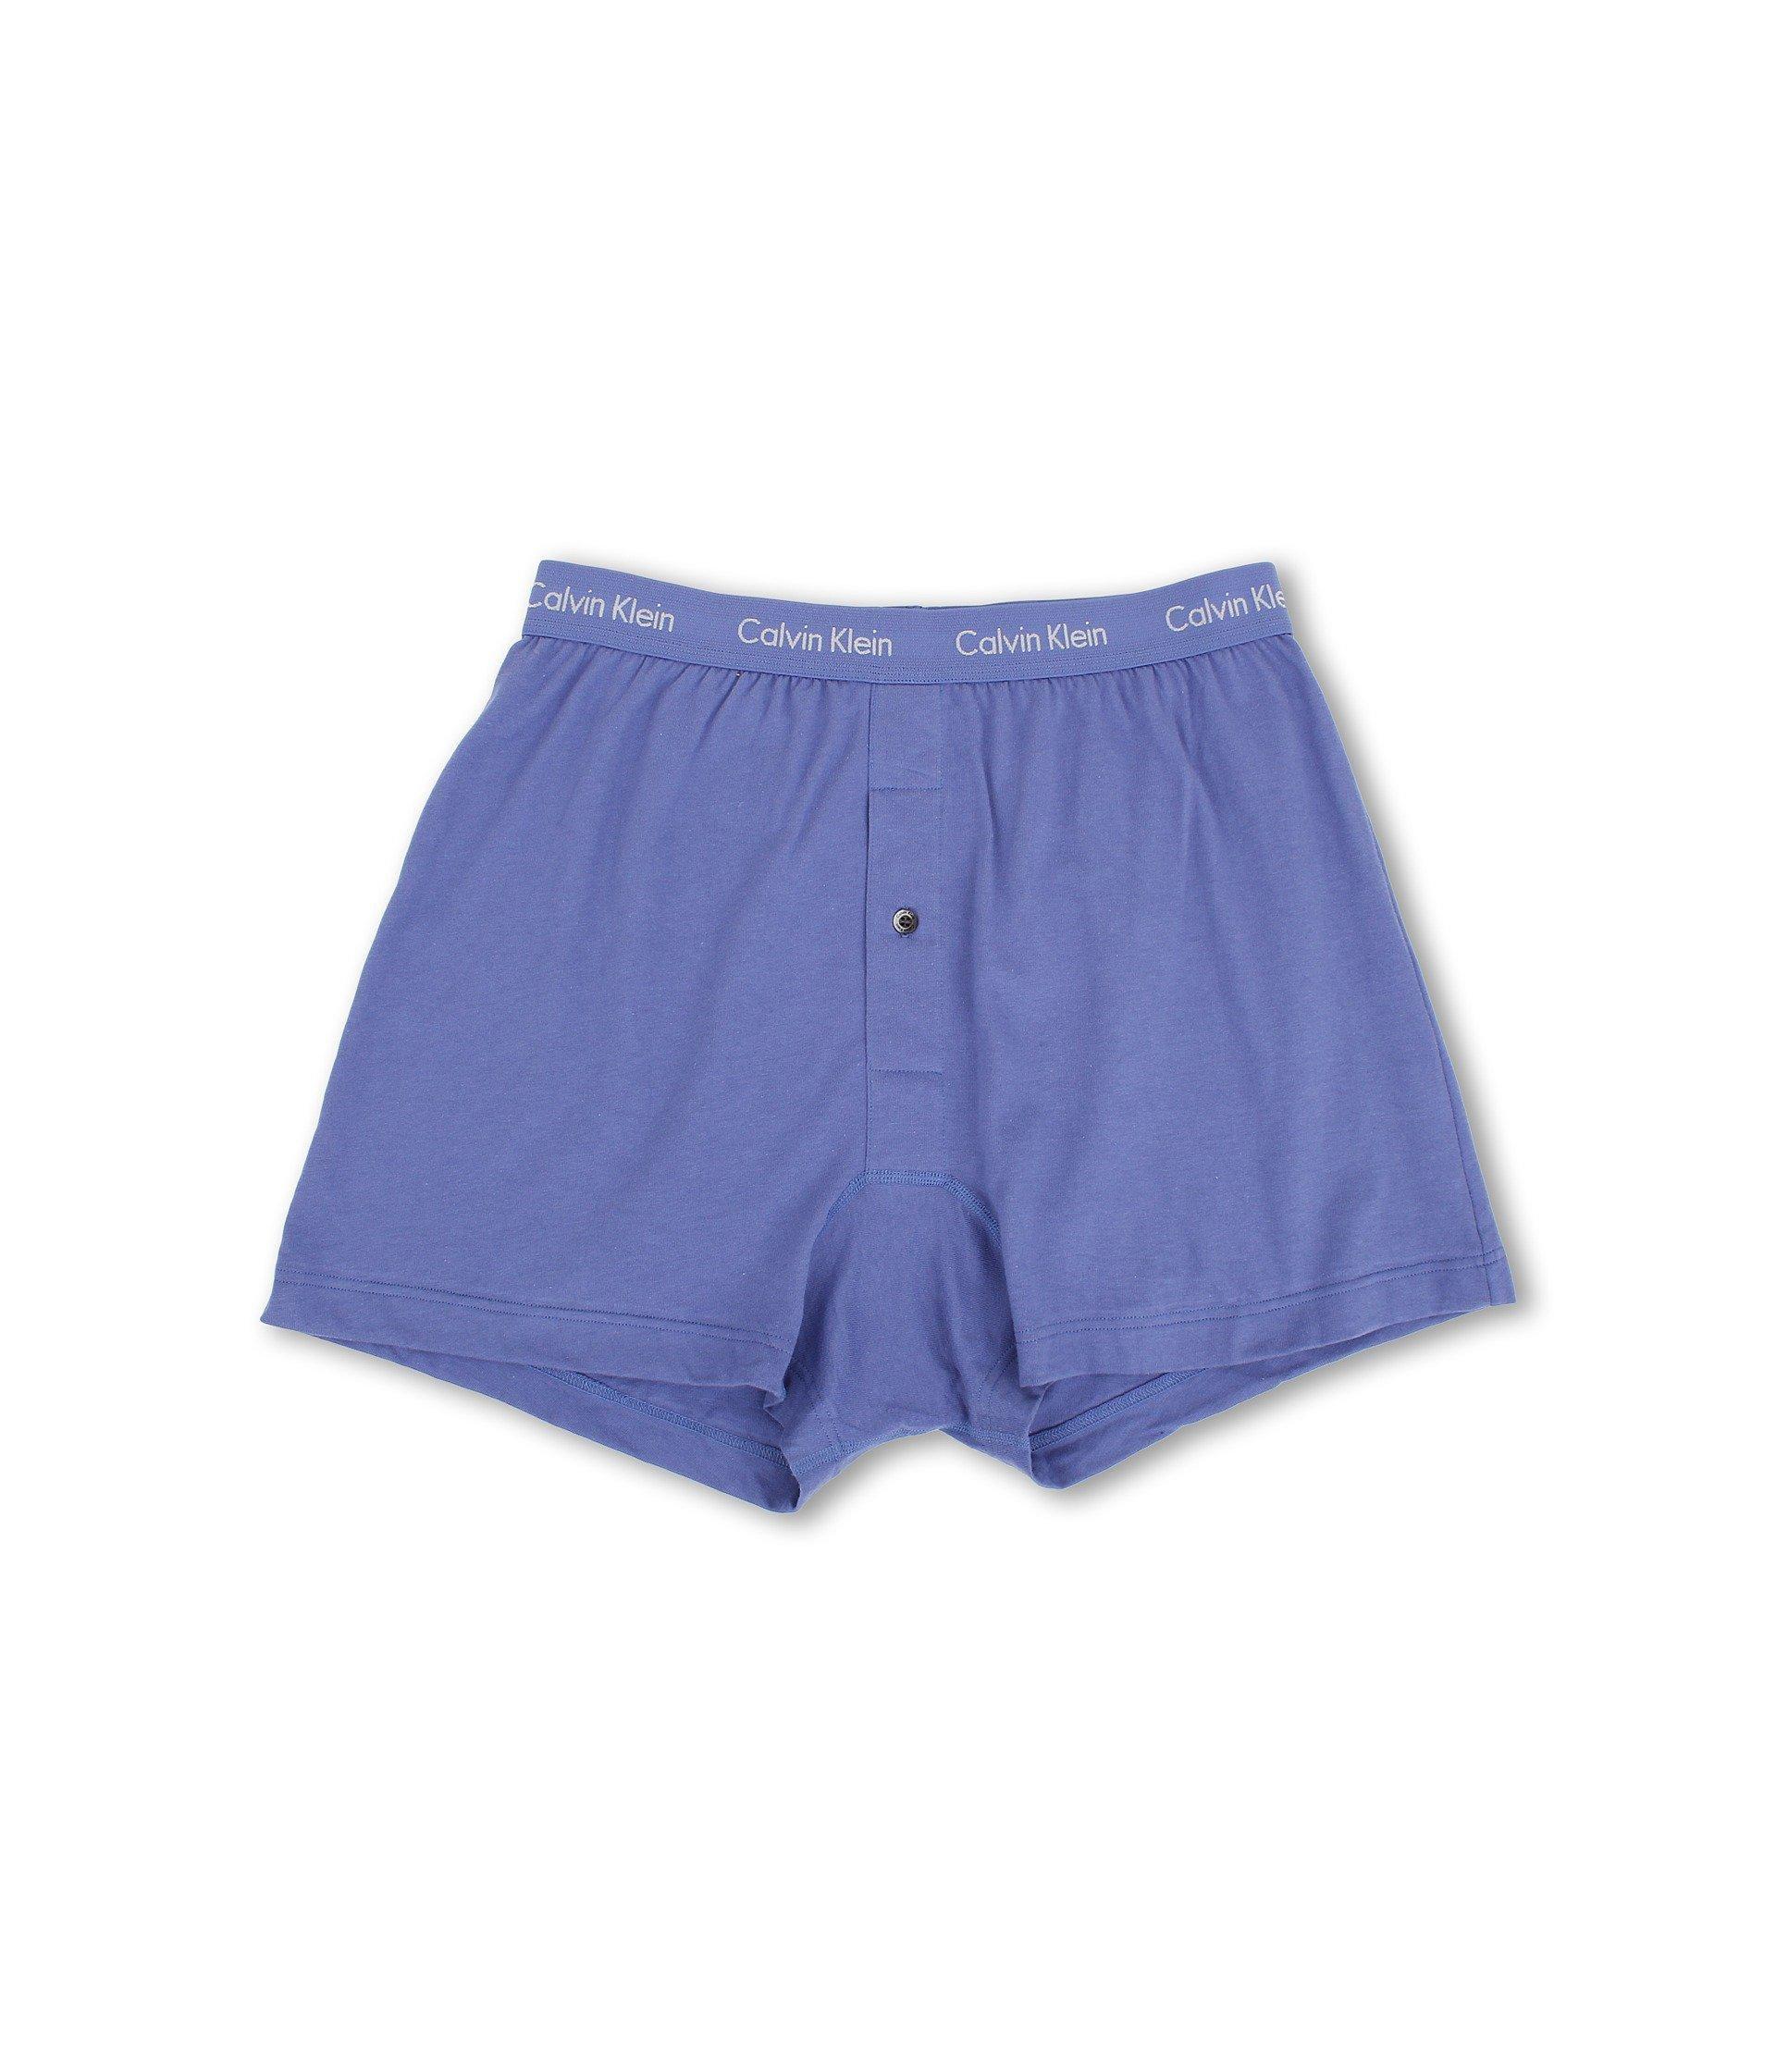 047ffd8d23 Calvin Klein - Blue Cotton Classic Knit Boxer 3-pack Nu3040 (black) Men s.  View fullscreen